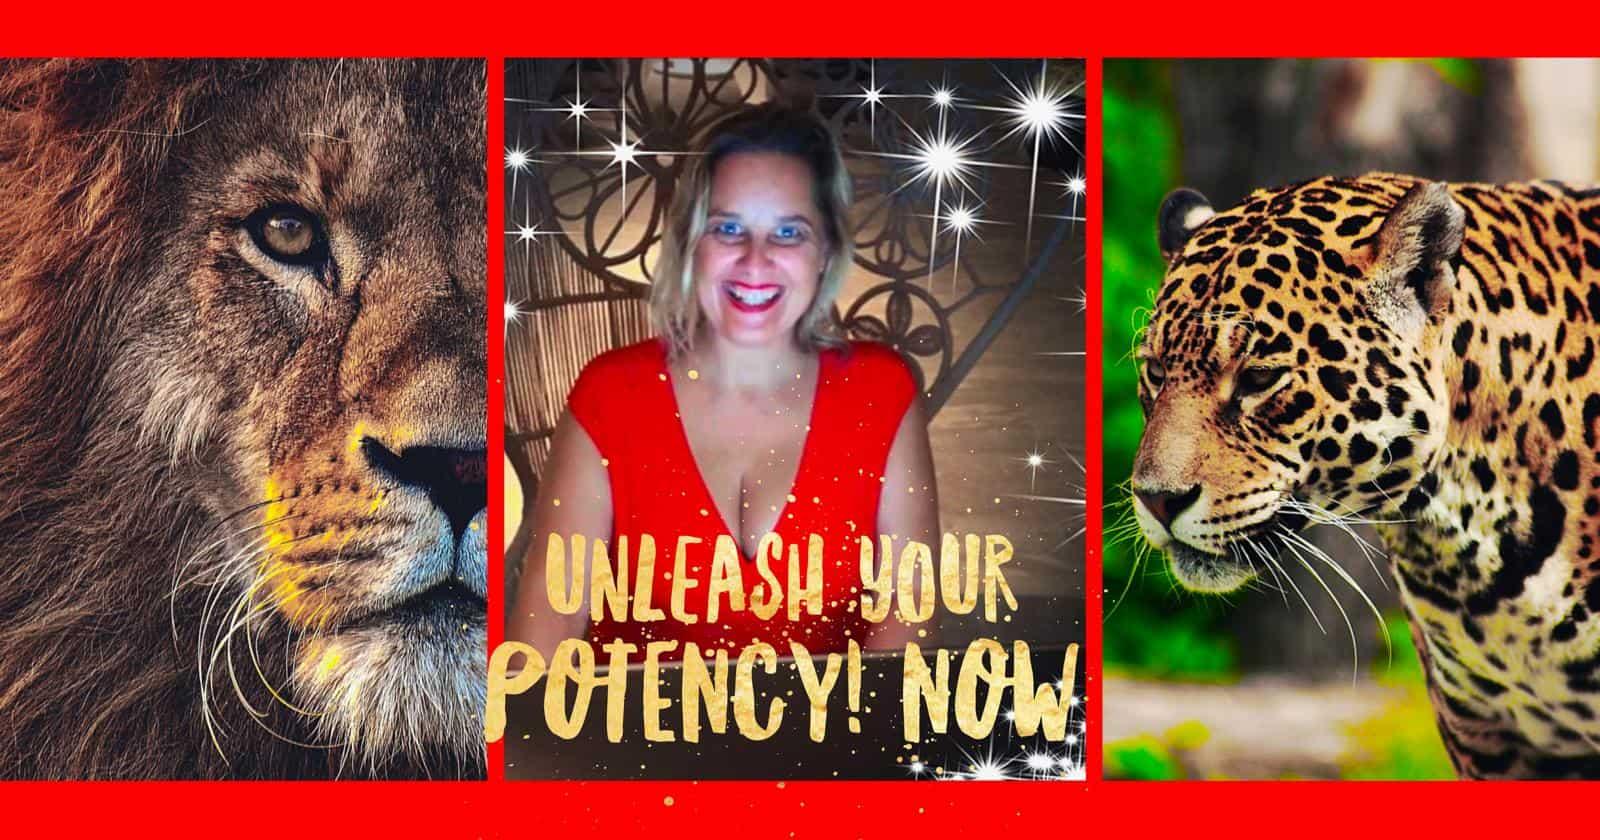 Unleash your Potency! Now